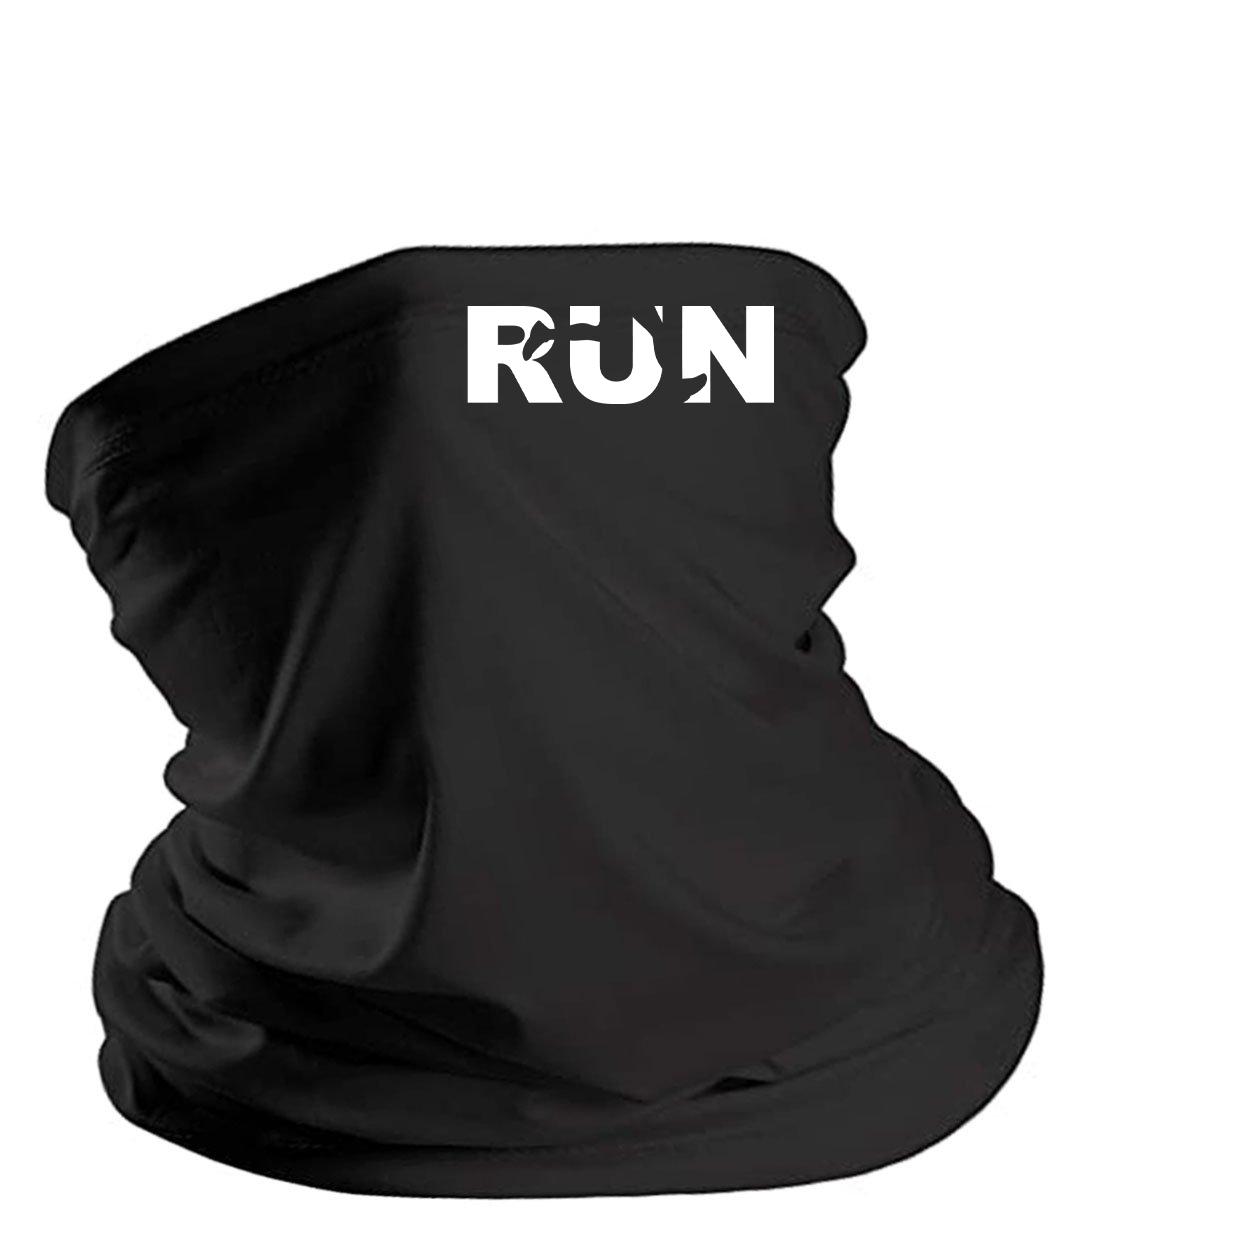 Run Jog Logo Night Out Lightweight Neck Gaiter Face Mask Black (White Logo)